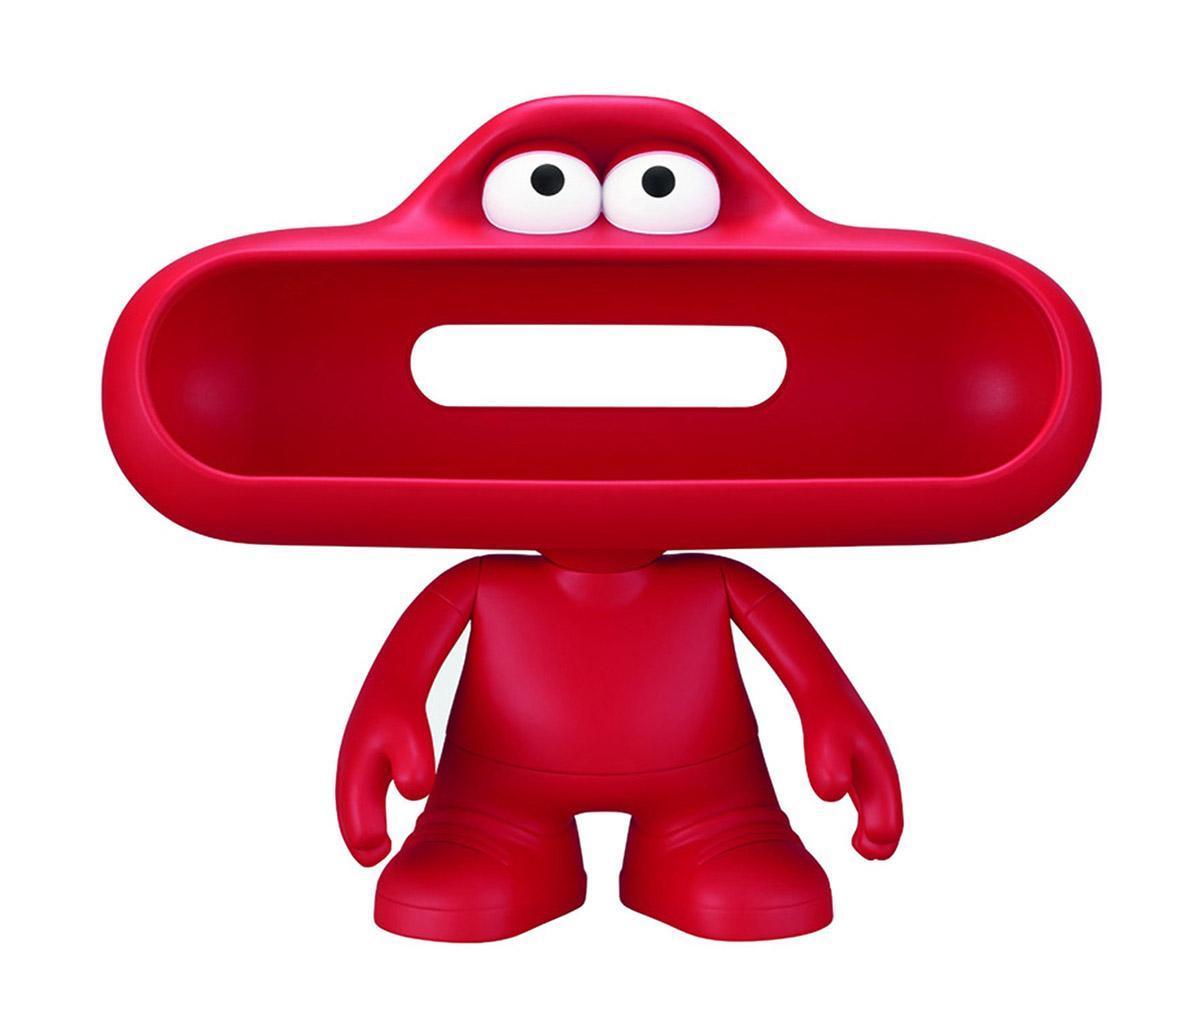 Beats Pill Dude, Red подставка под портативную акустику ( Pill Dude, Red )